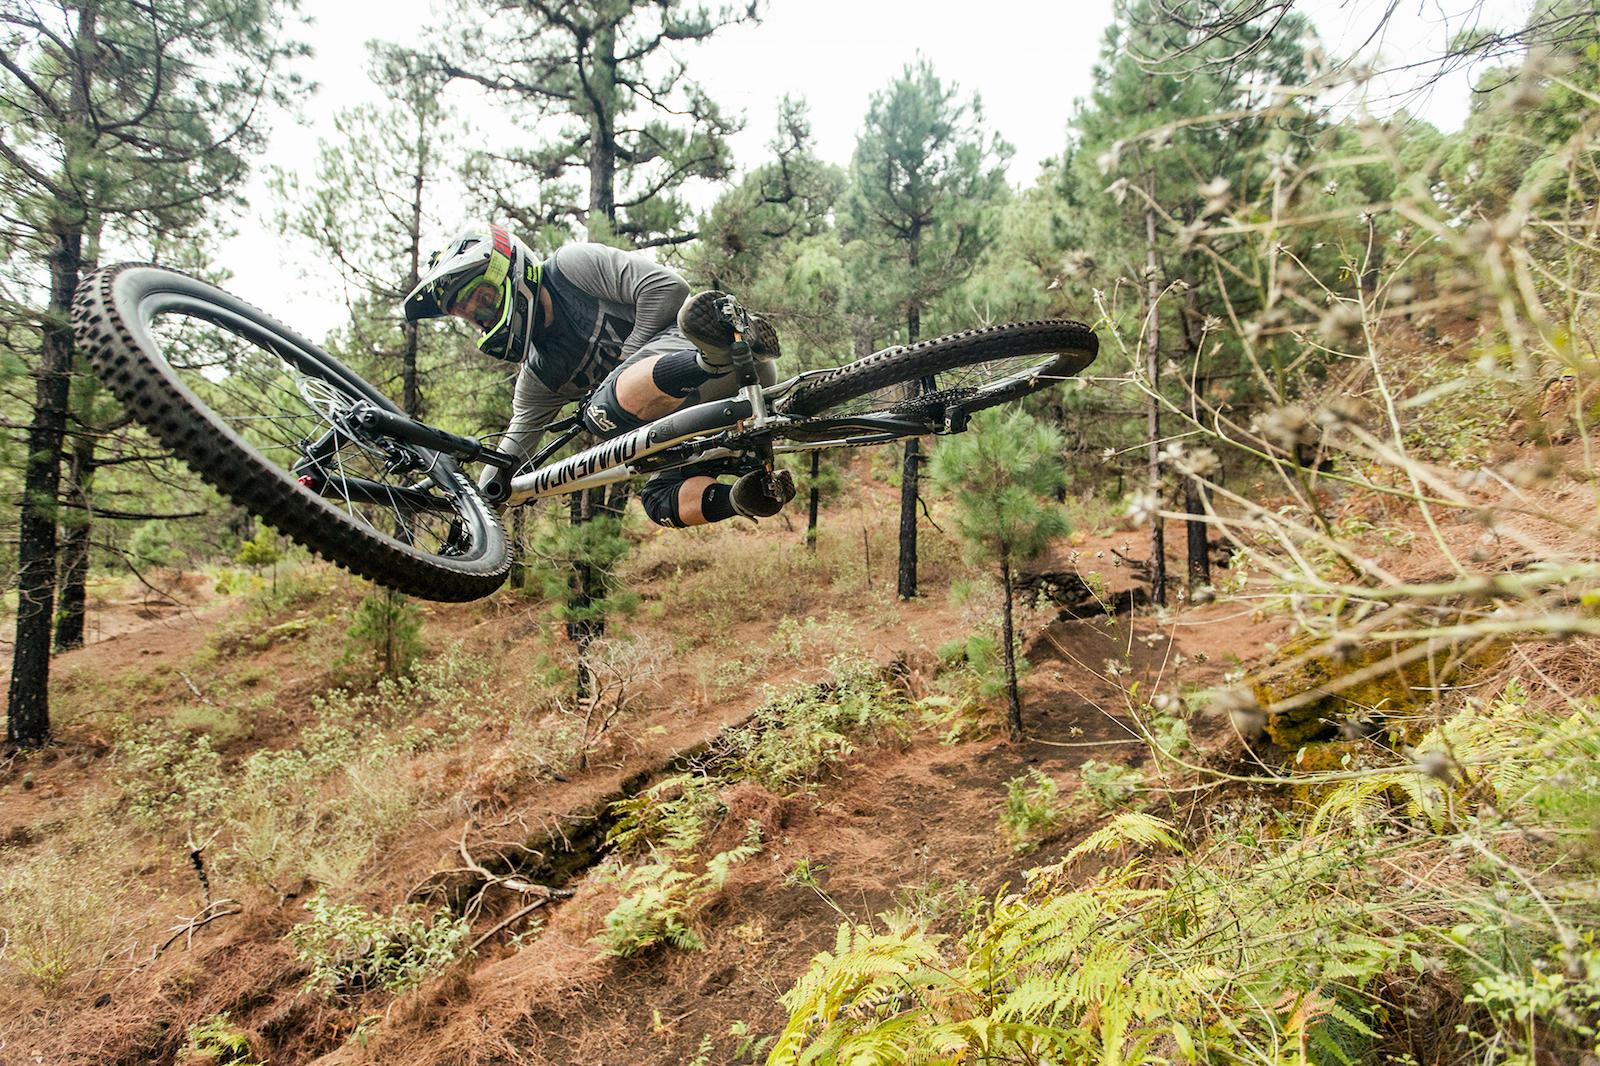 Location : La Palma / Rider : Rémi Thirion